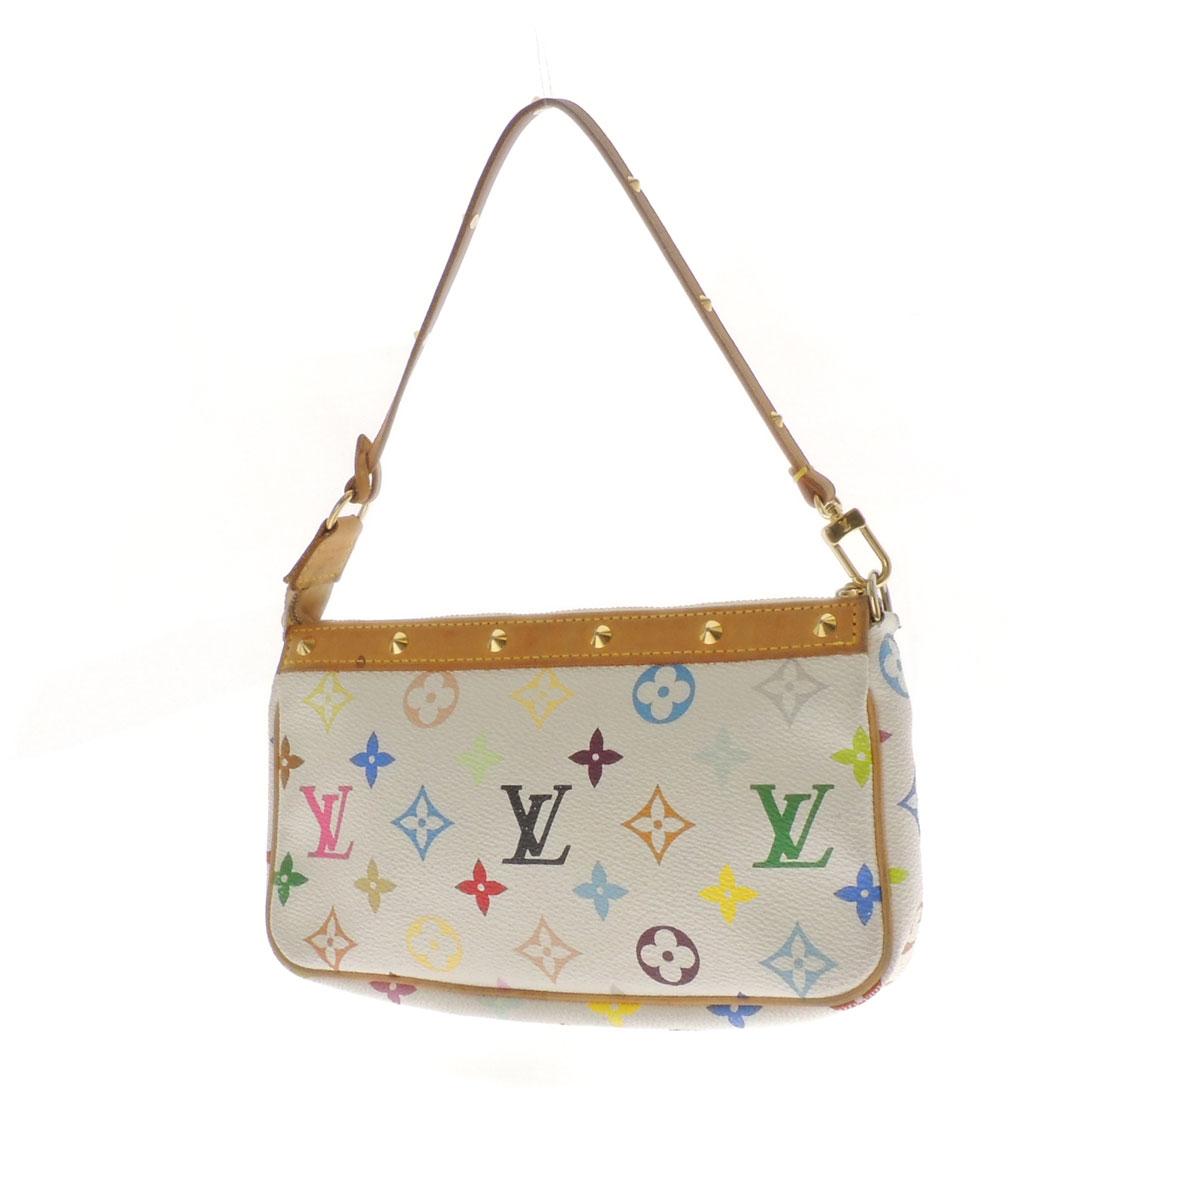 LOUIS VUITTON ポシェットアクセソワール M92649 accessory pouch multi-colored Monogram Canvas ladies fs3gm